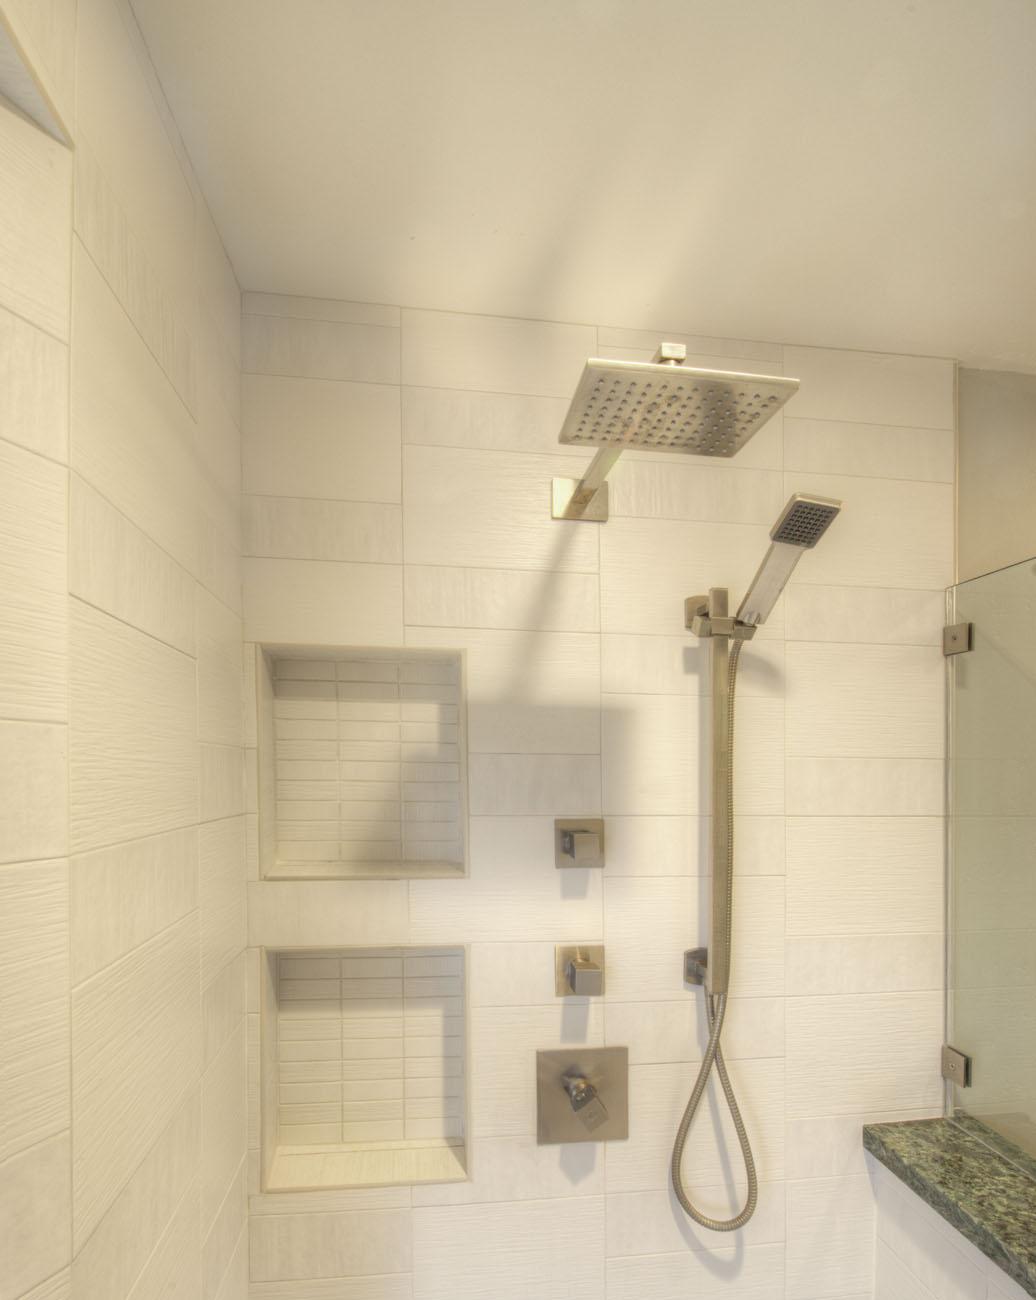 Remodeling Companies San Diego Minimalist Design Bathroom Remodel San Diego  Lars Remodeling & Design